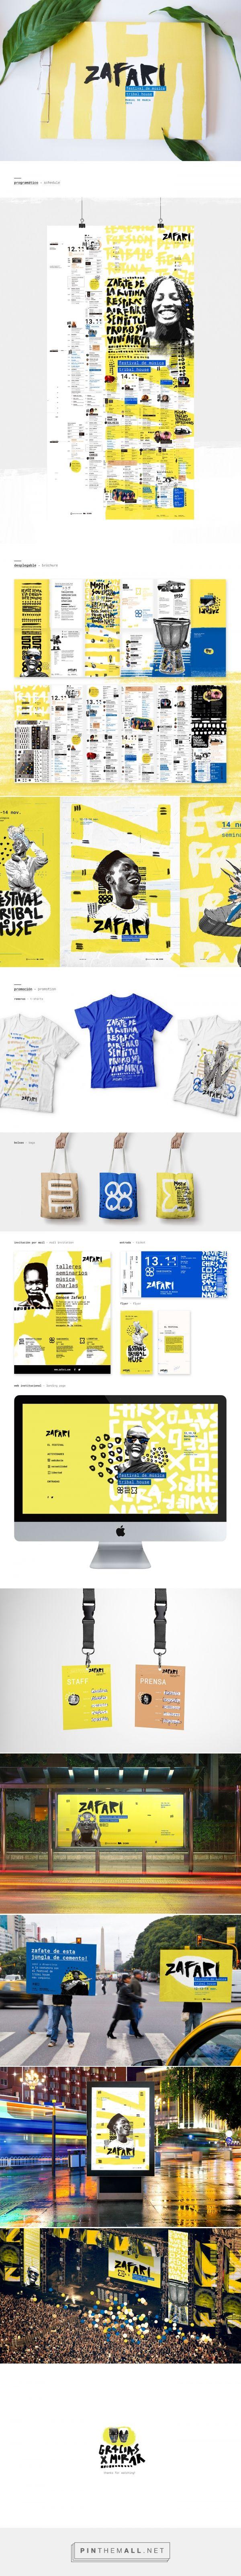 Zafari Festival Branding by Jennifer Reid   Fivestar Branding Agency – Design and Branding Agency & Curated Inspiration Gallery